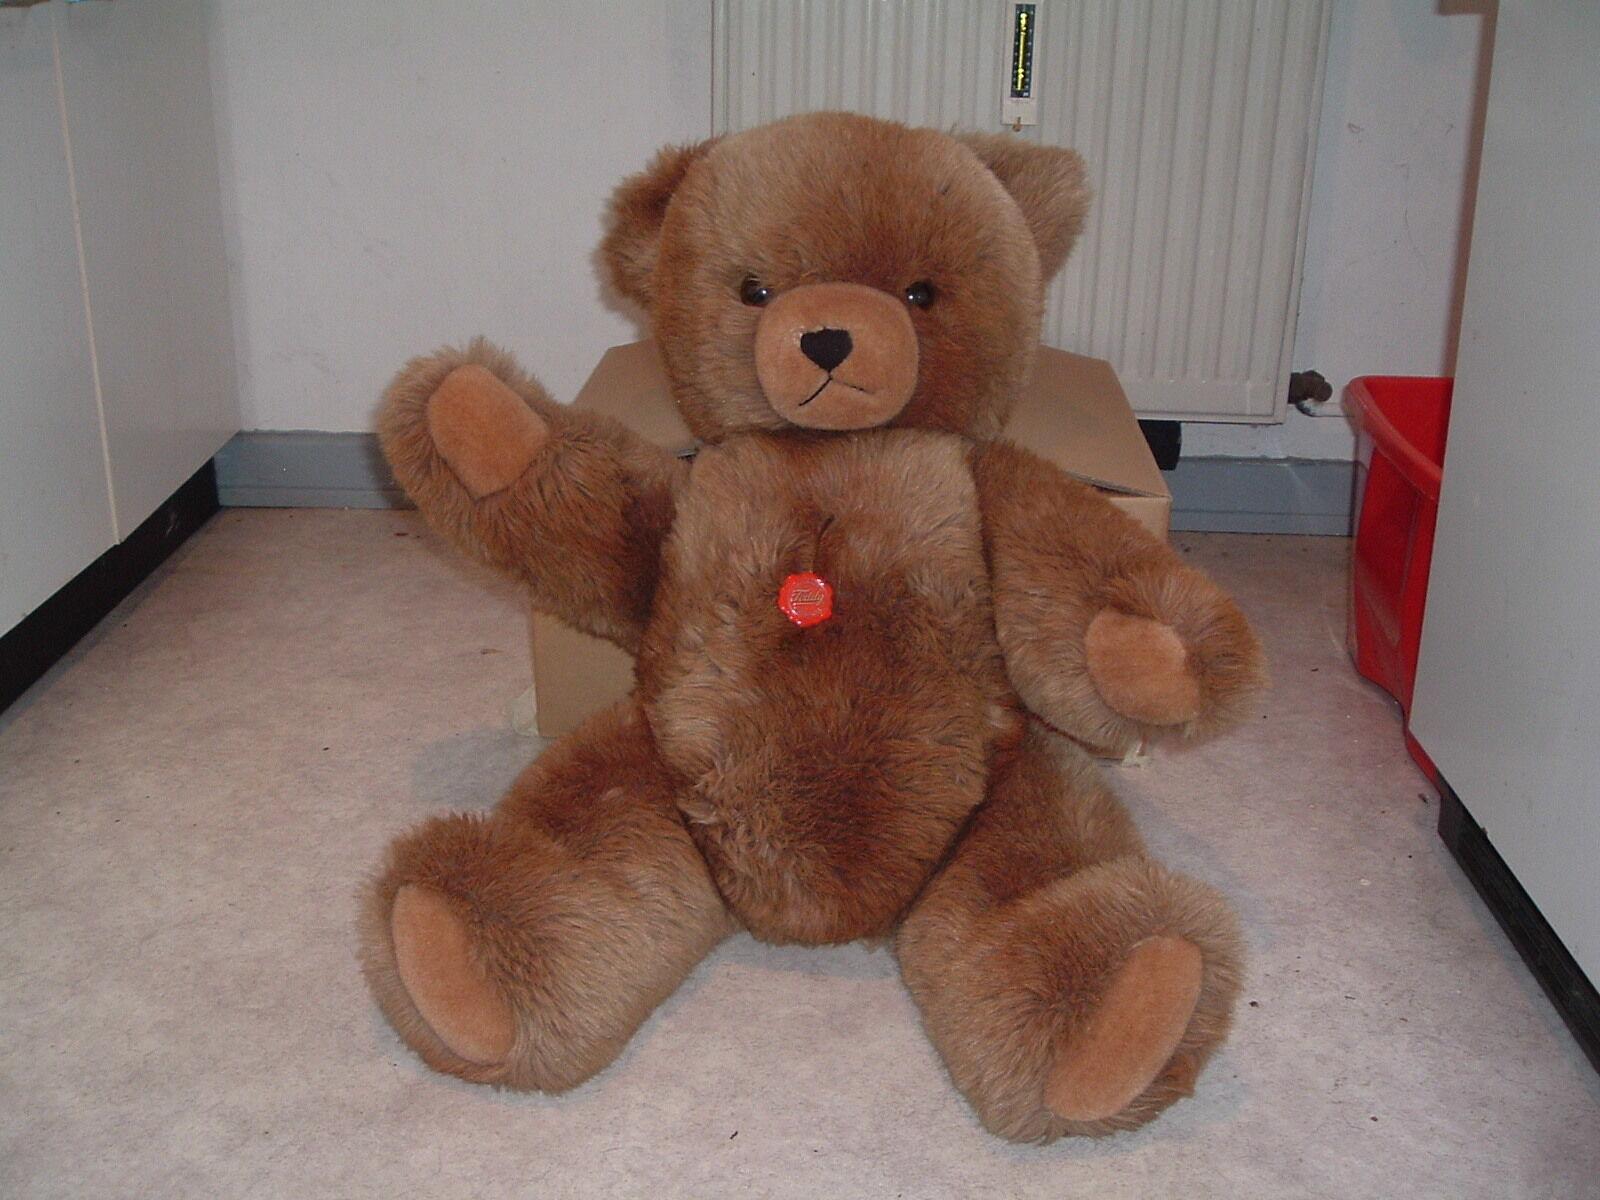 Teddy Hermann Teddybär 80cm / RIESIG SÜSS  WUNDERSCHÖN BÄR